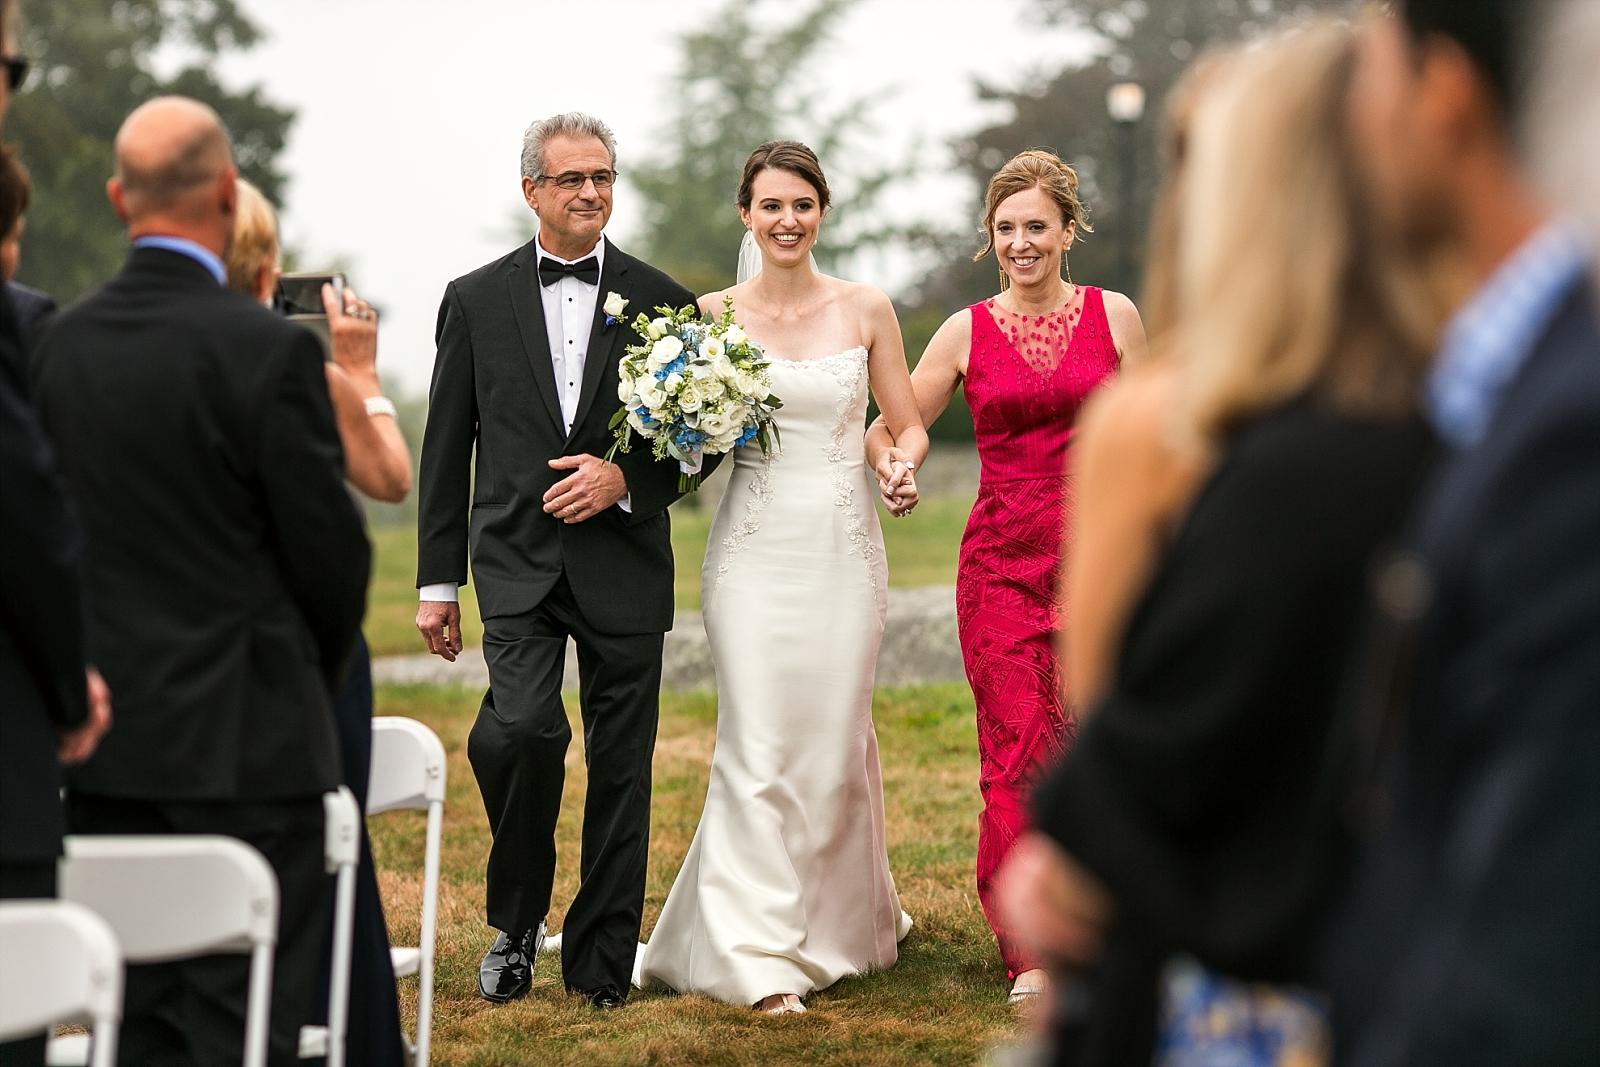 CT_Wedding_Photographer_JaTe_Gal_06.jpg